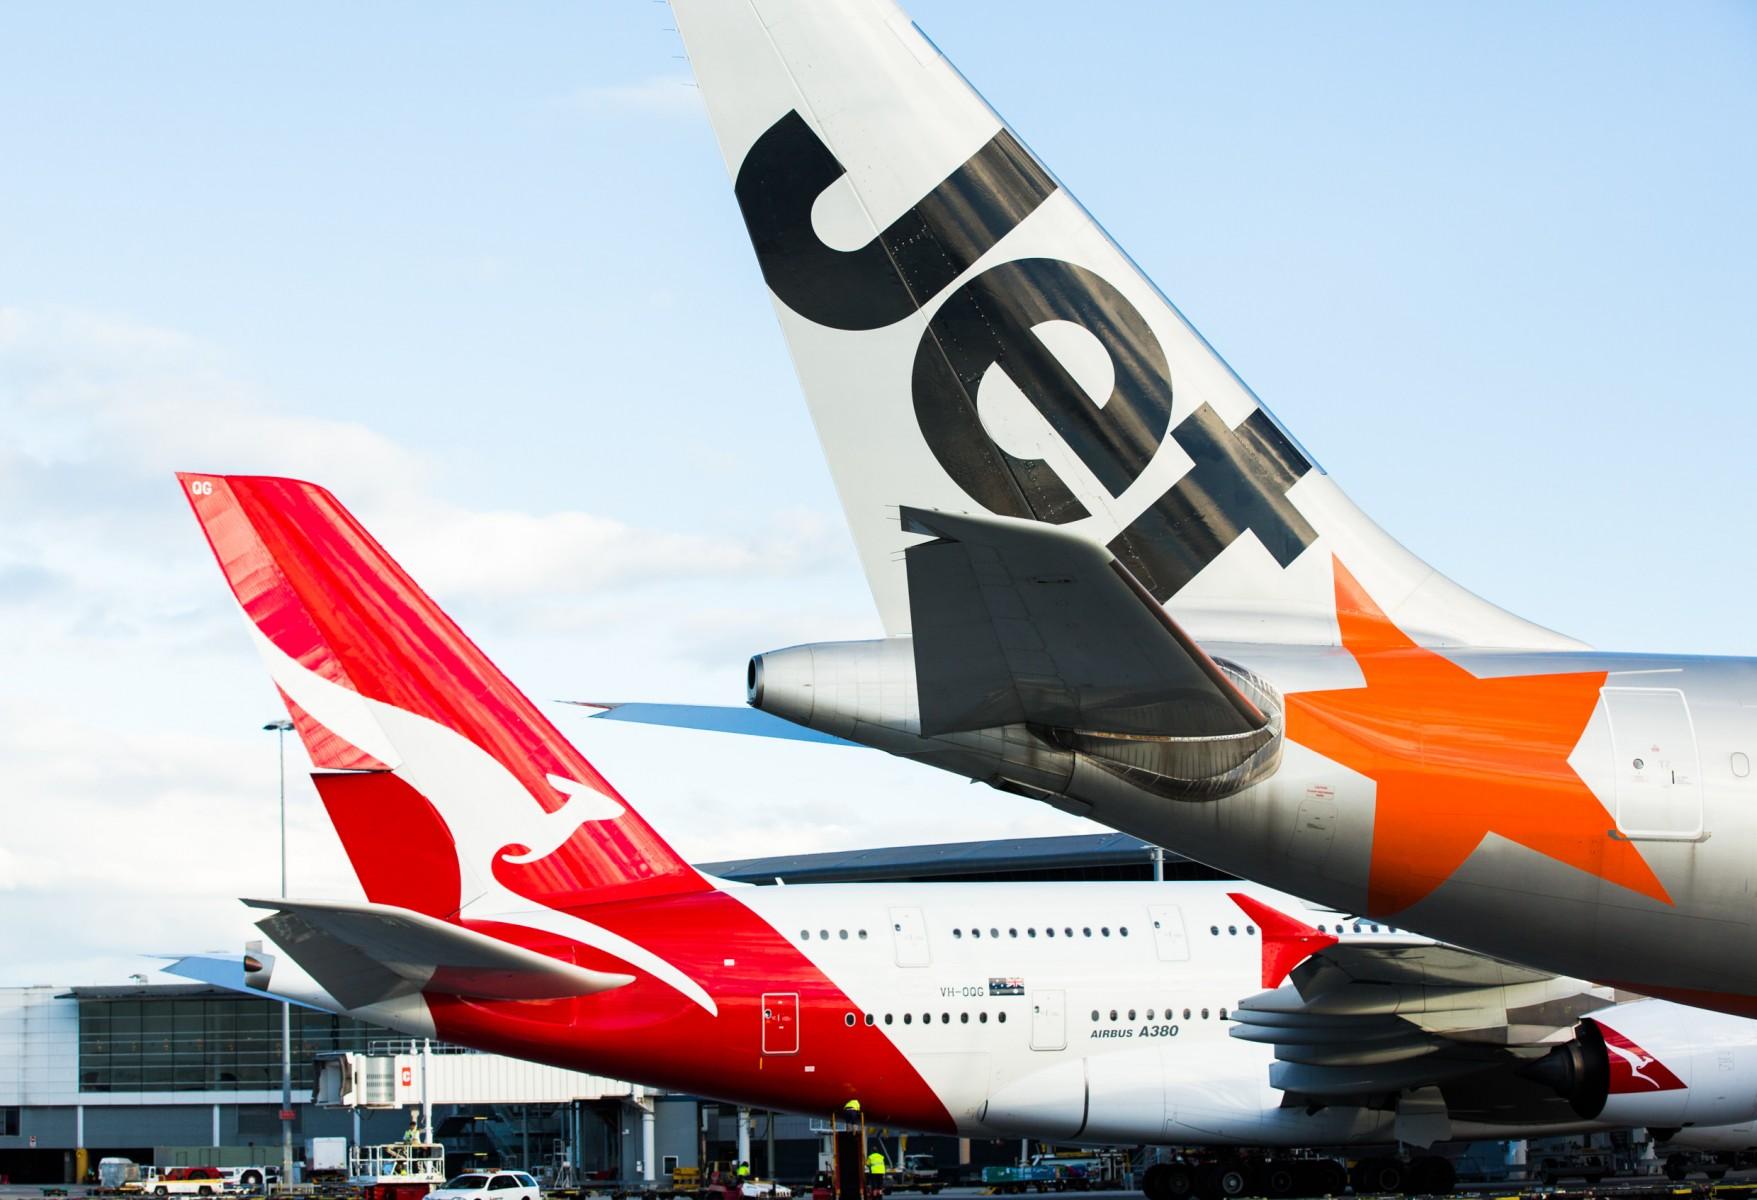 Jetstar And Qantas Partner To Bring More Australians Home